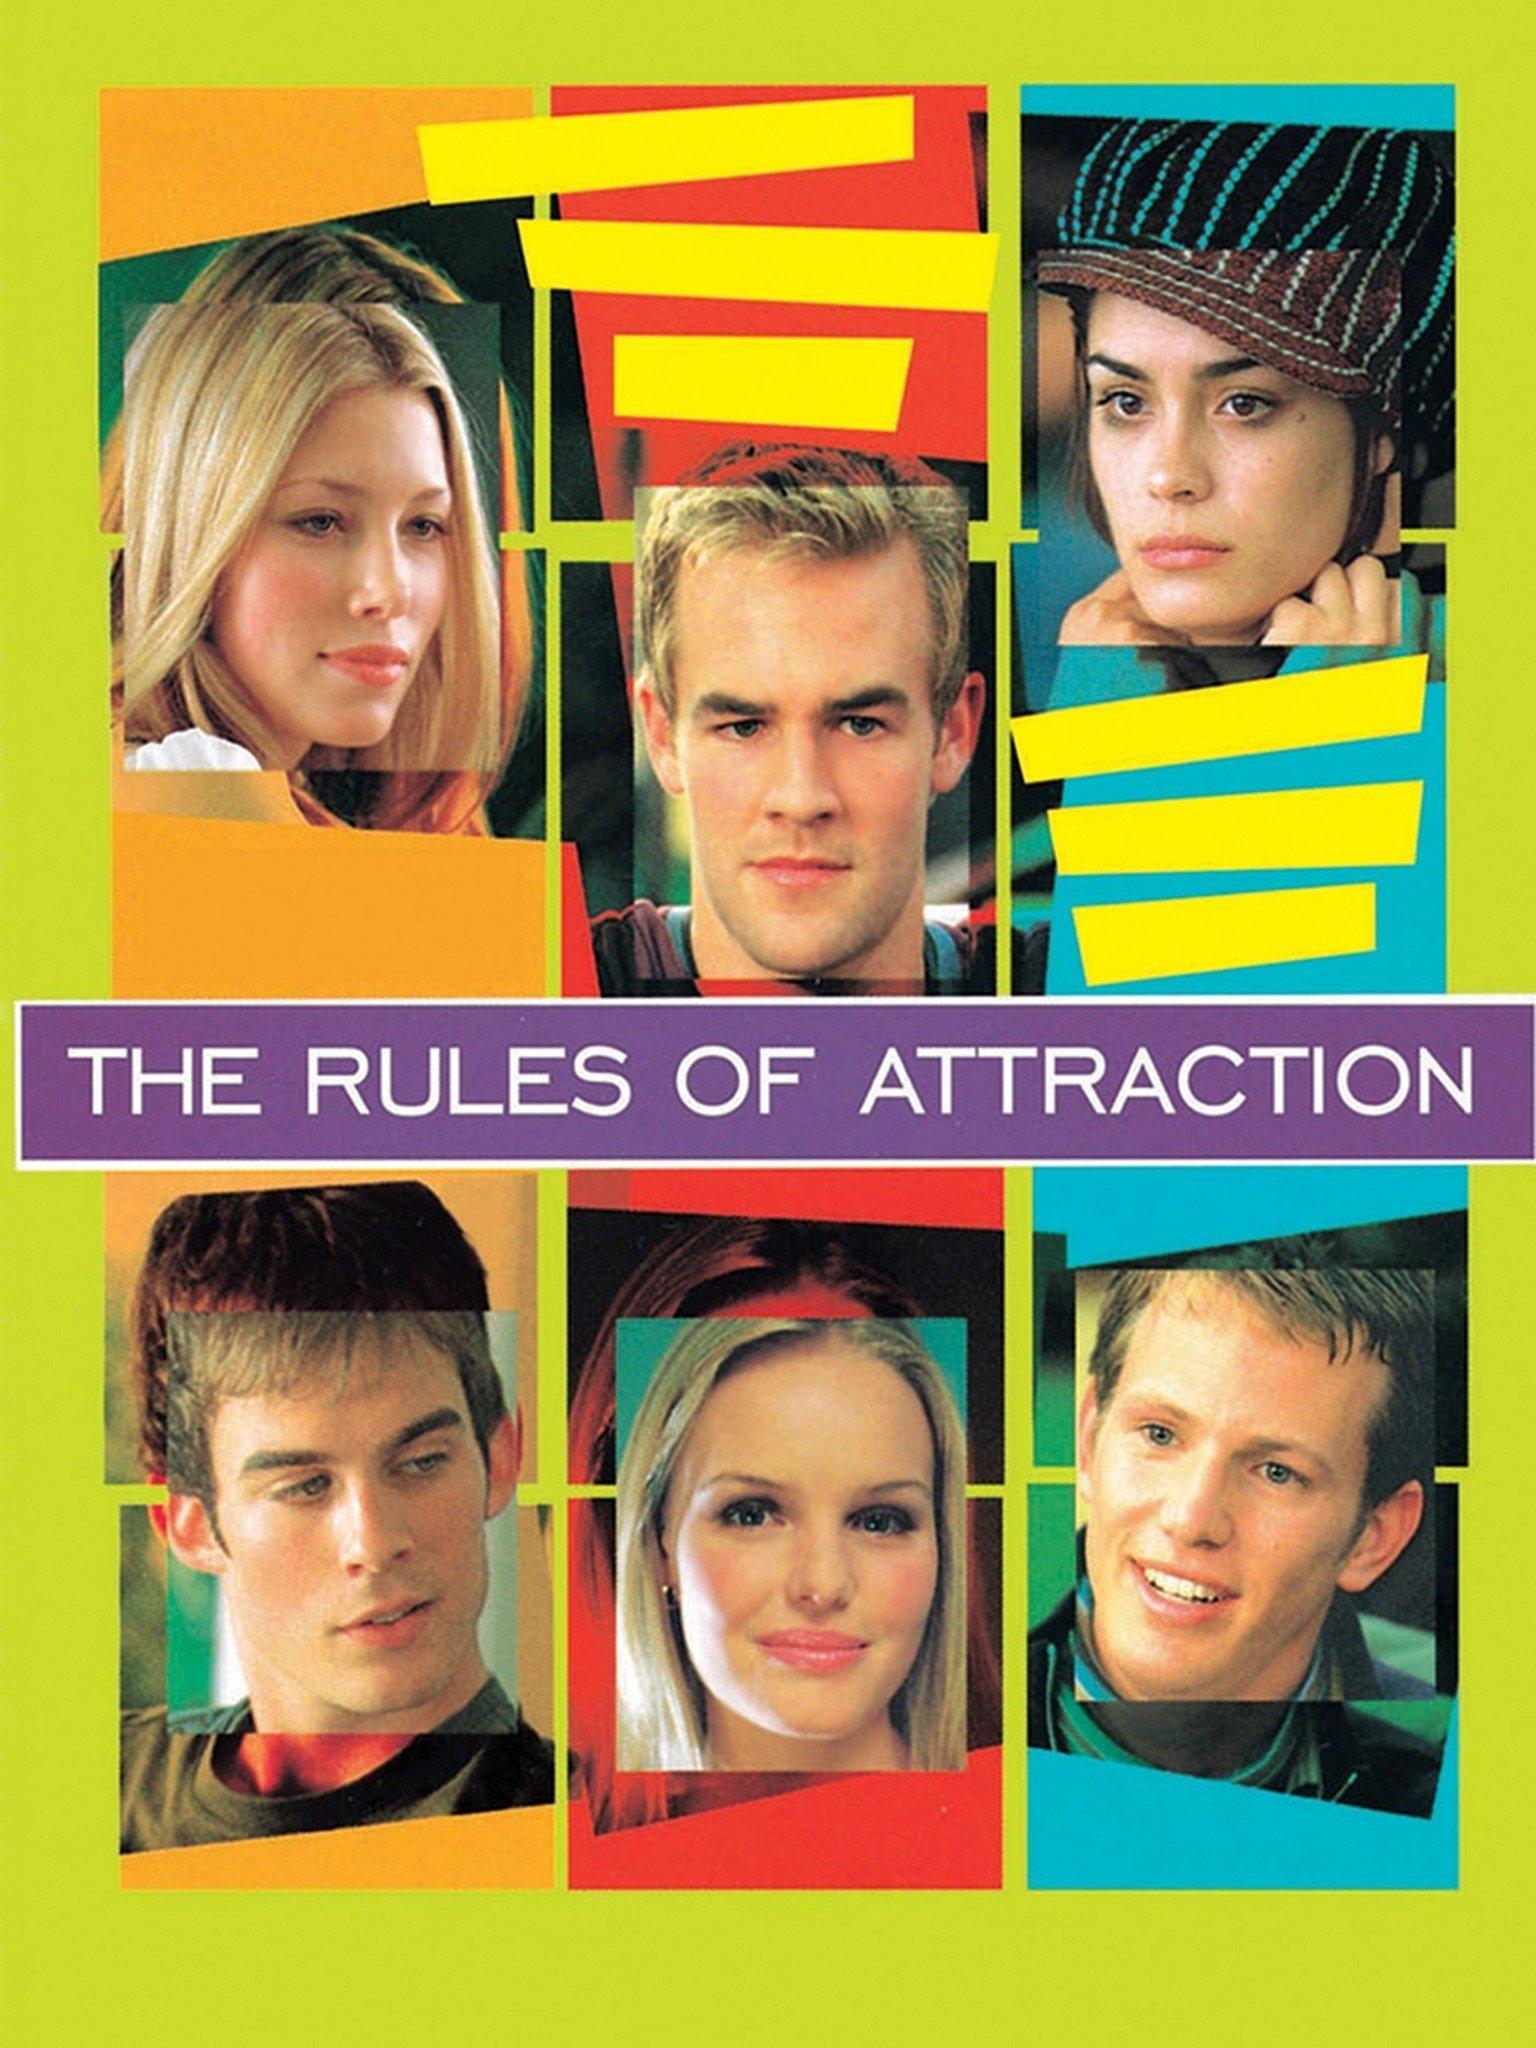 Les Lois De L'attraction Film : l'attraction, Rules, Attraction, (2002), Rotten, Tomatoes